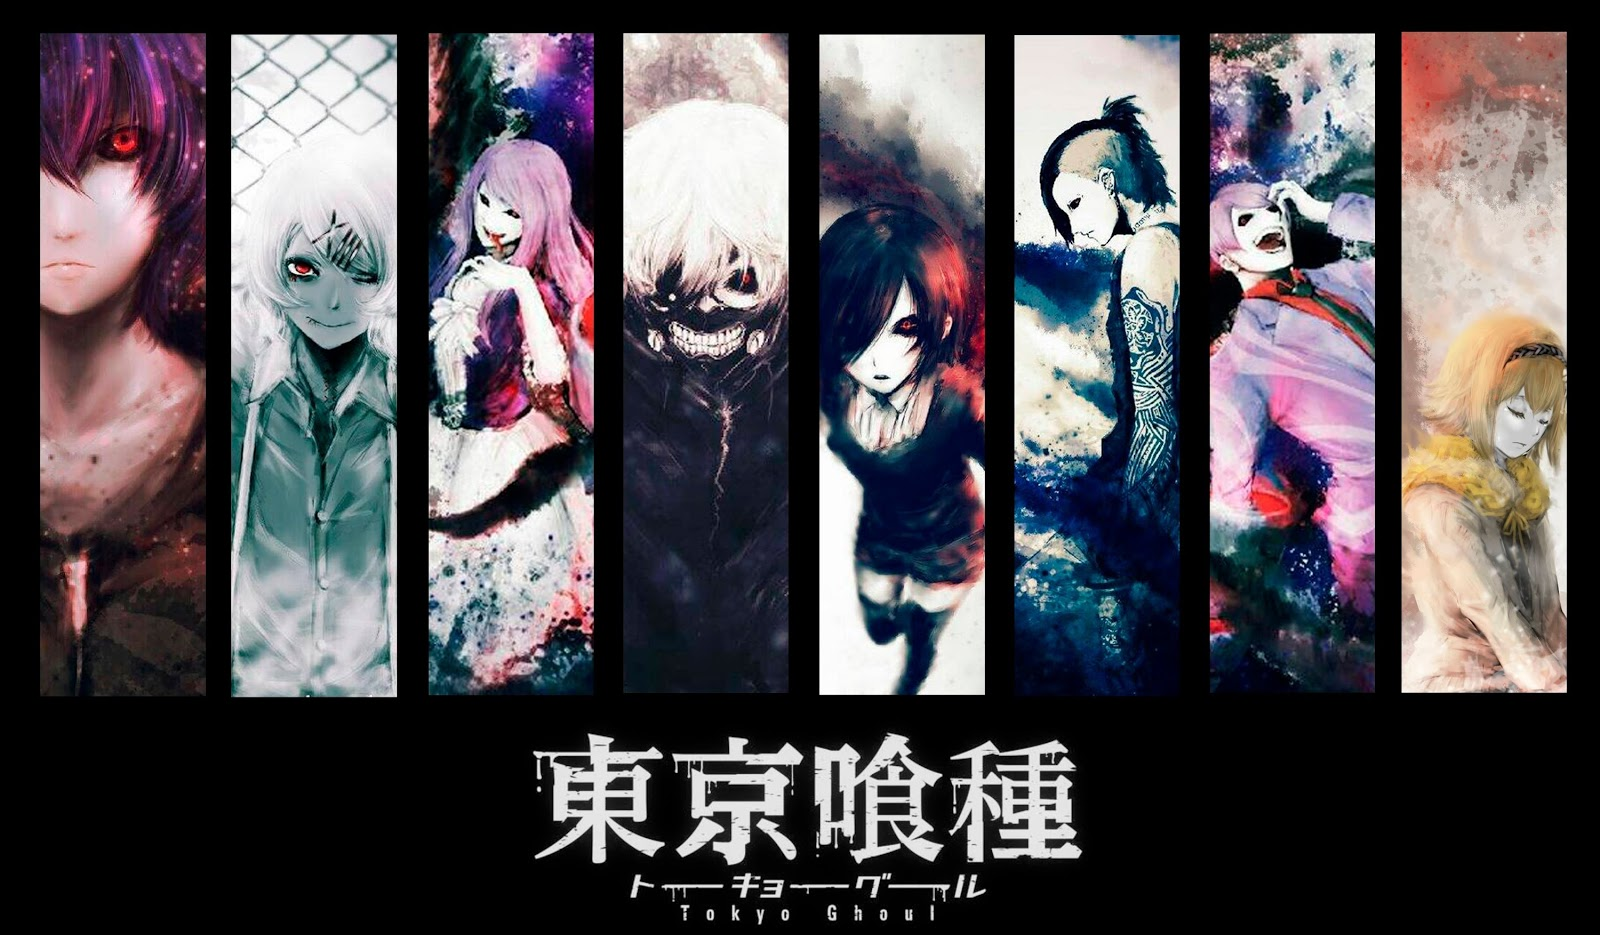 Tokyo Ghoul characters wallpaper hd